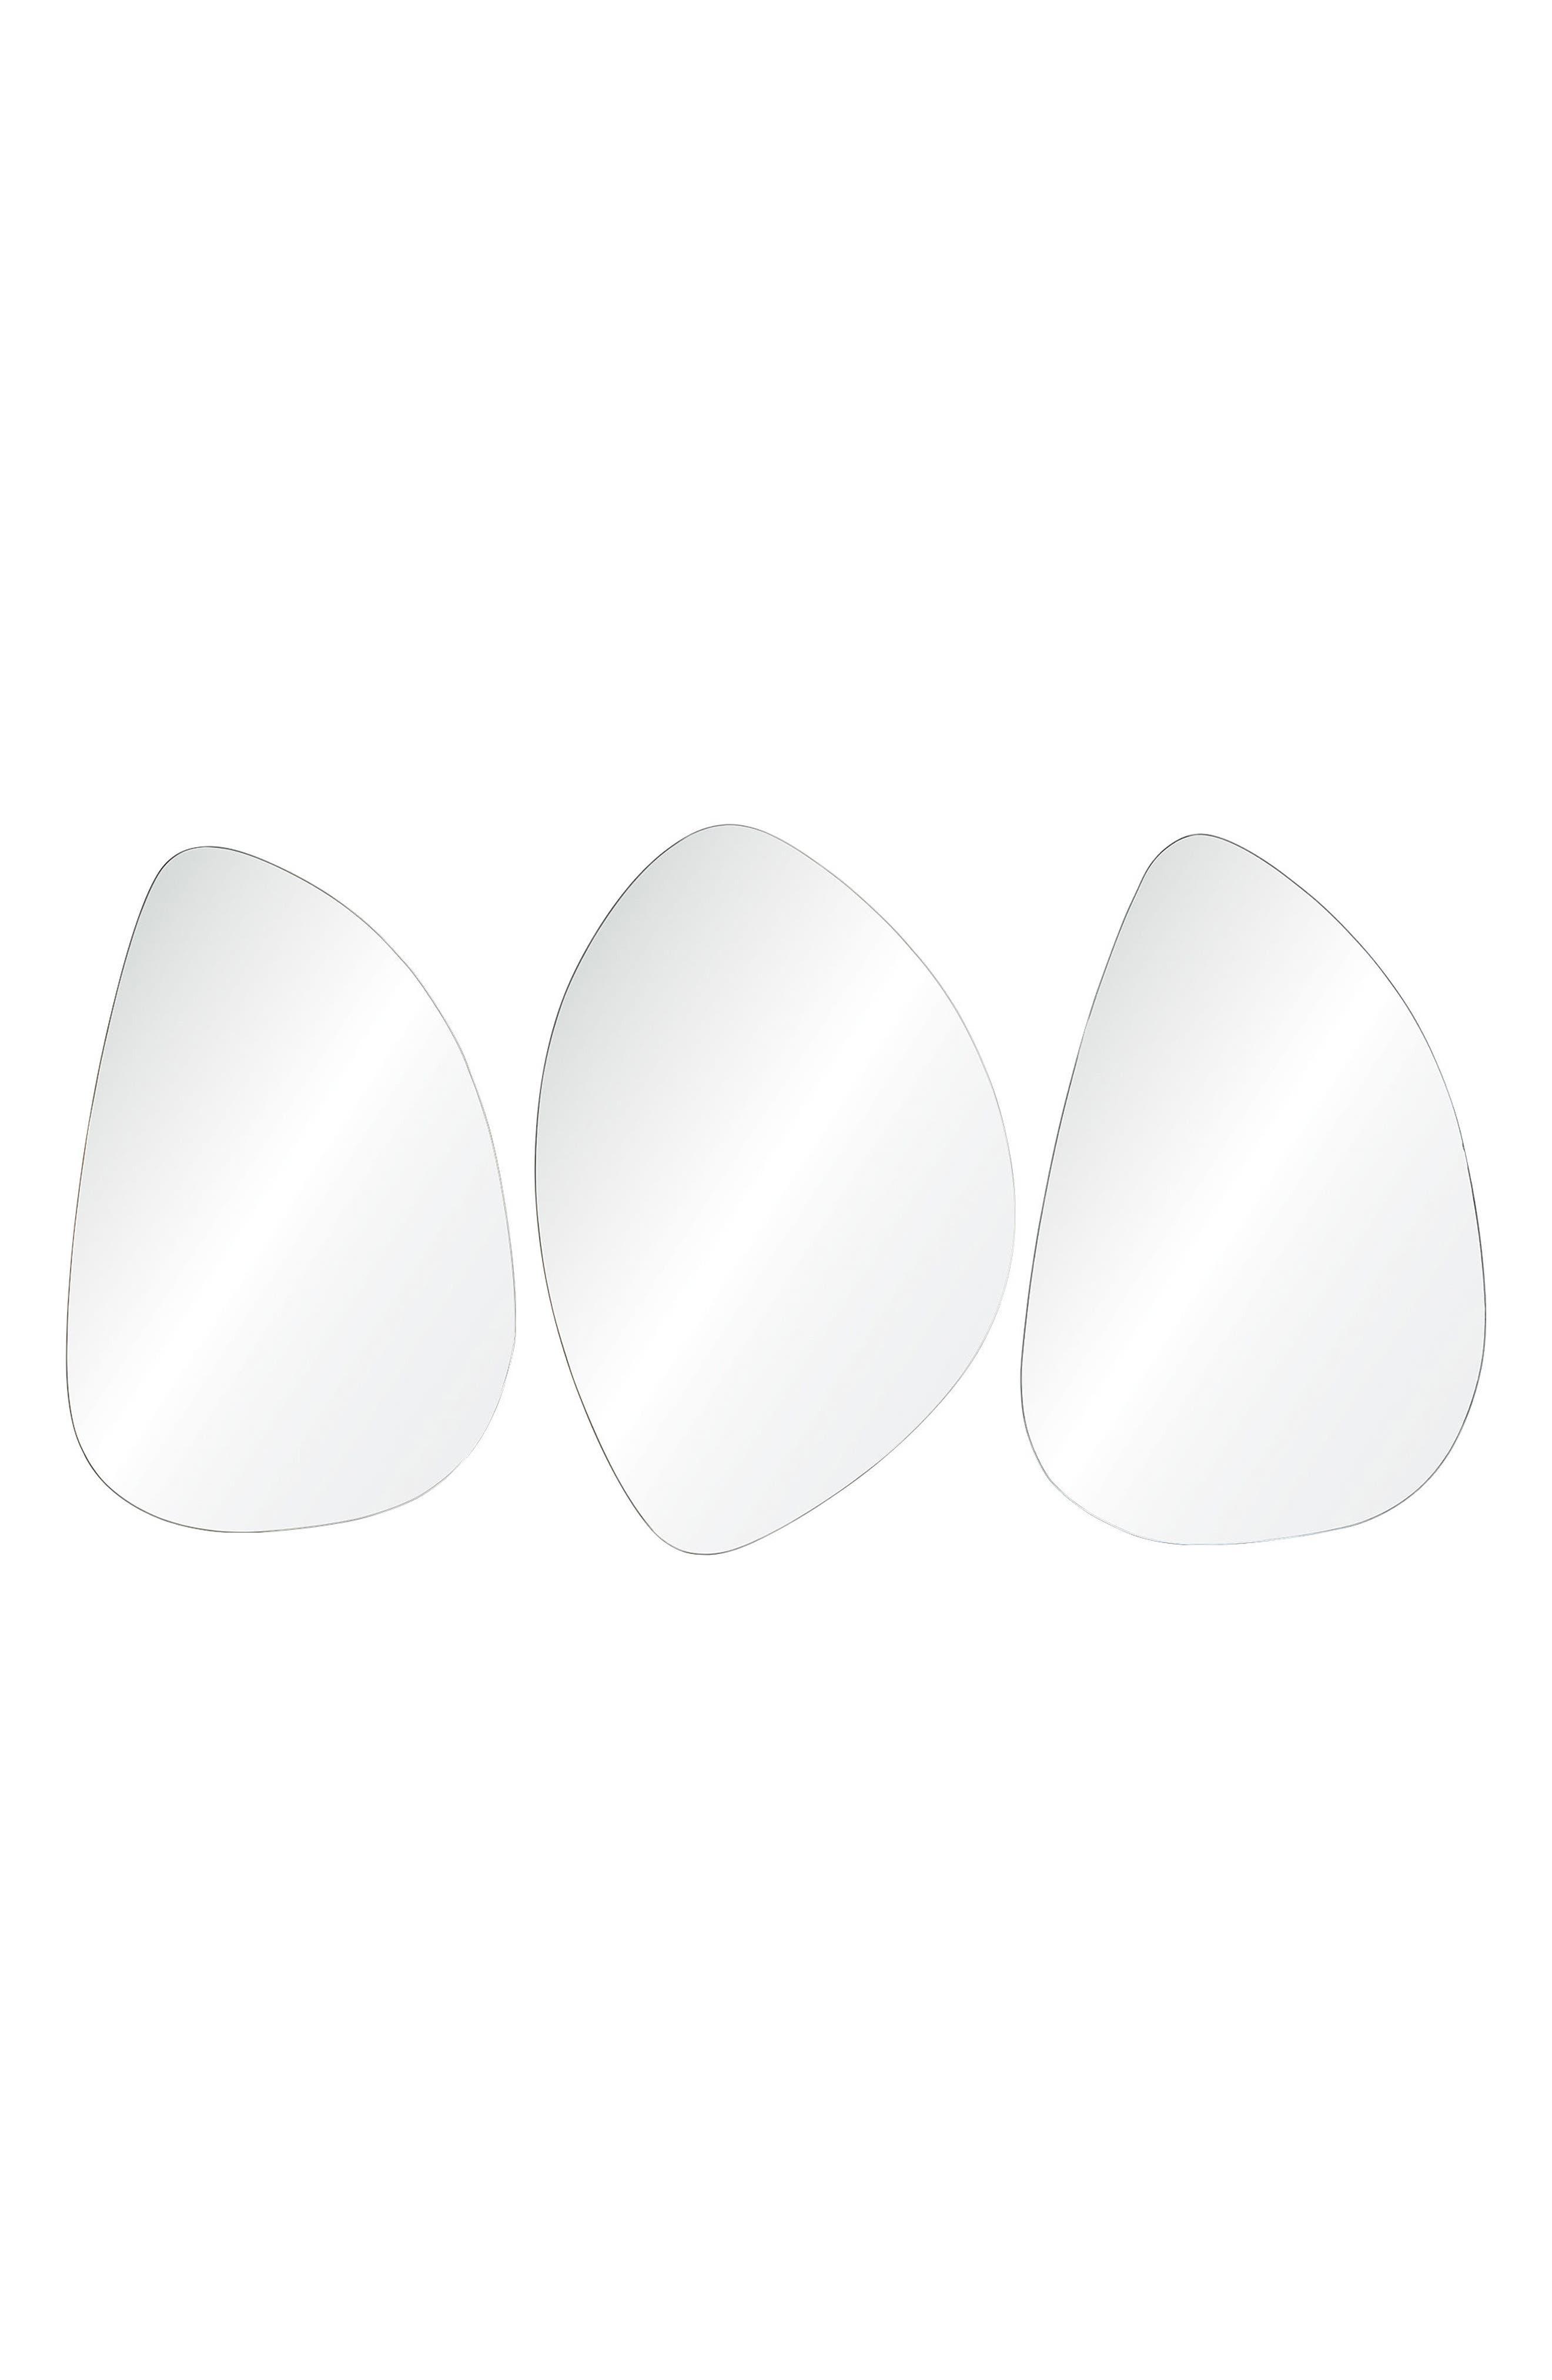 Stockdale Set of 3 Mirrors,                             Main thumbnail 1, color,